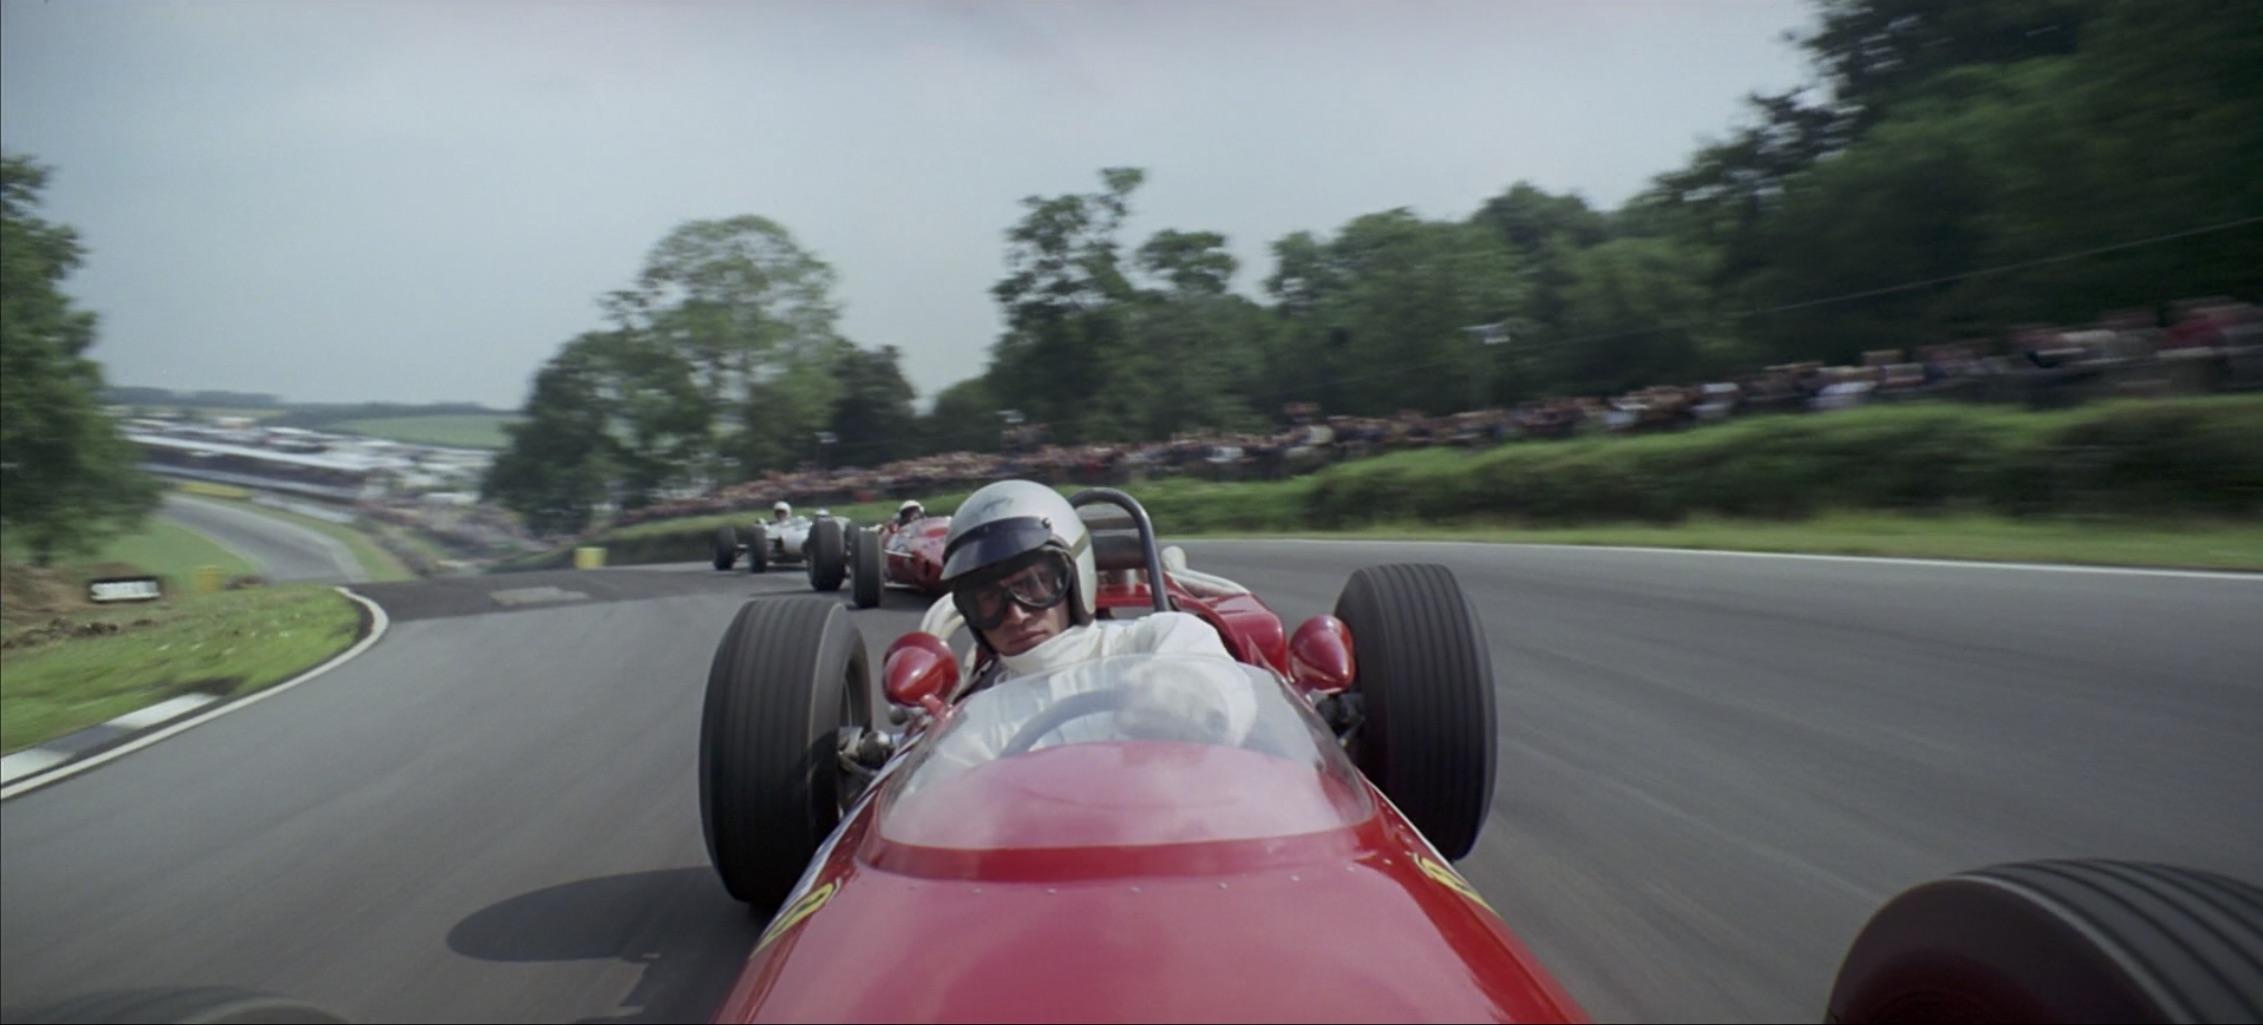 Grand Prix Ferrari in the lead